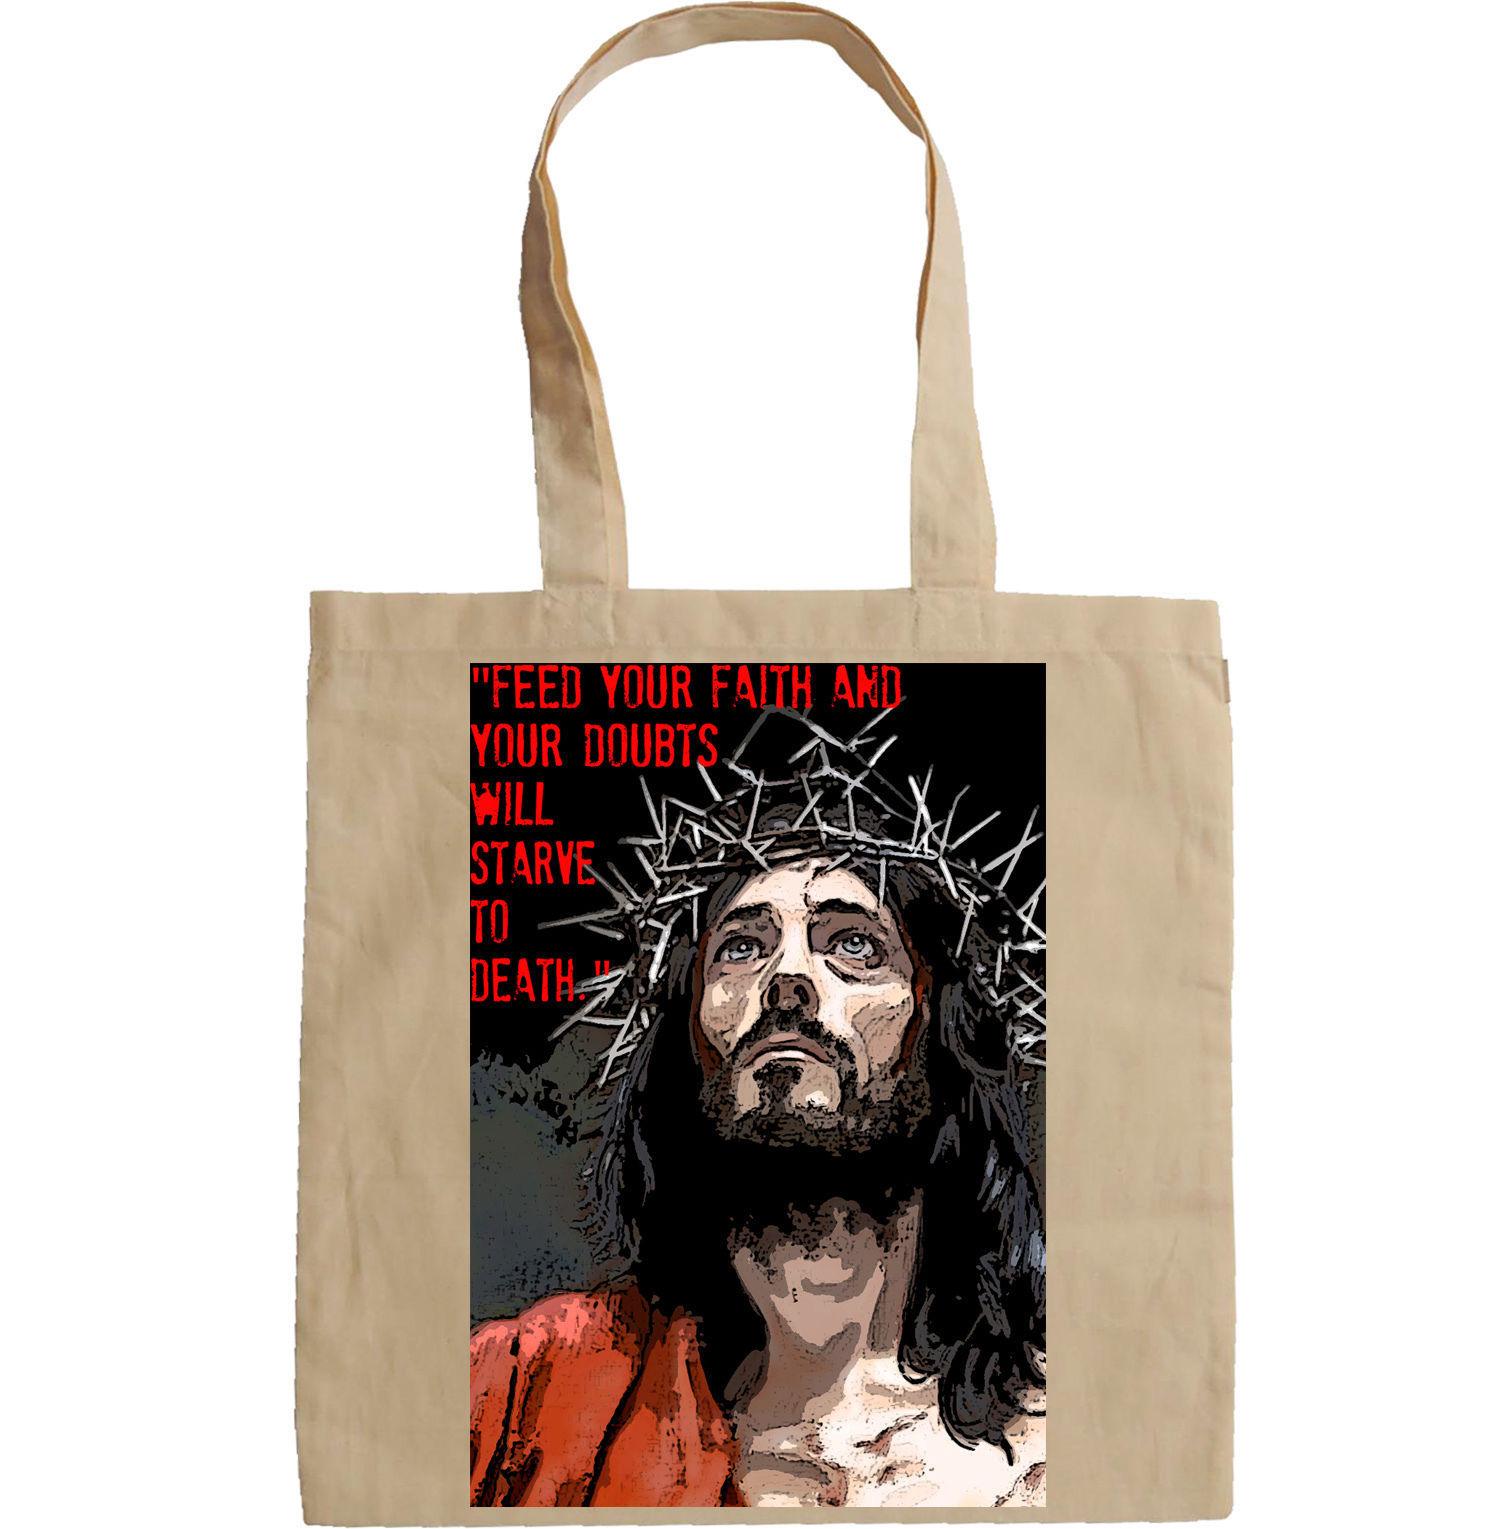 JESUS CHRIST QUOTE - NEW AMAZING GRAPHIC HAND BAG/TOTE BAG